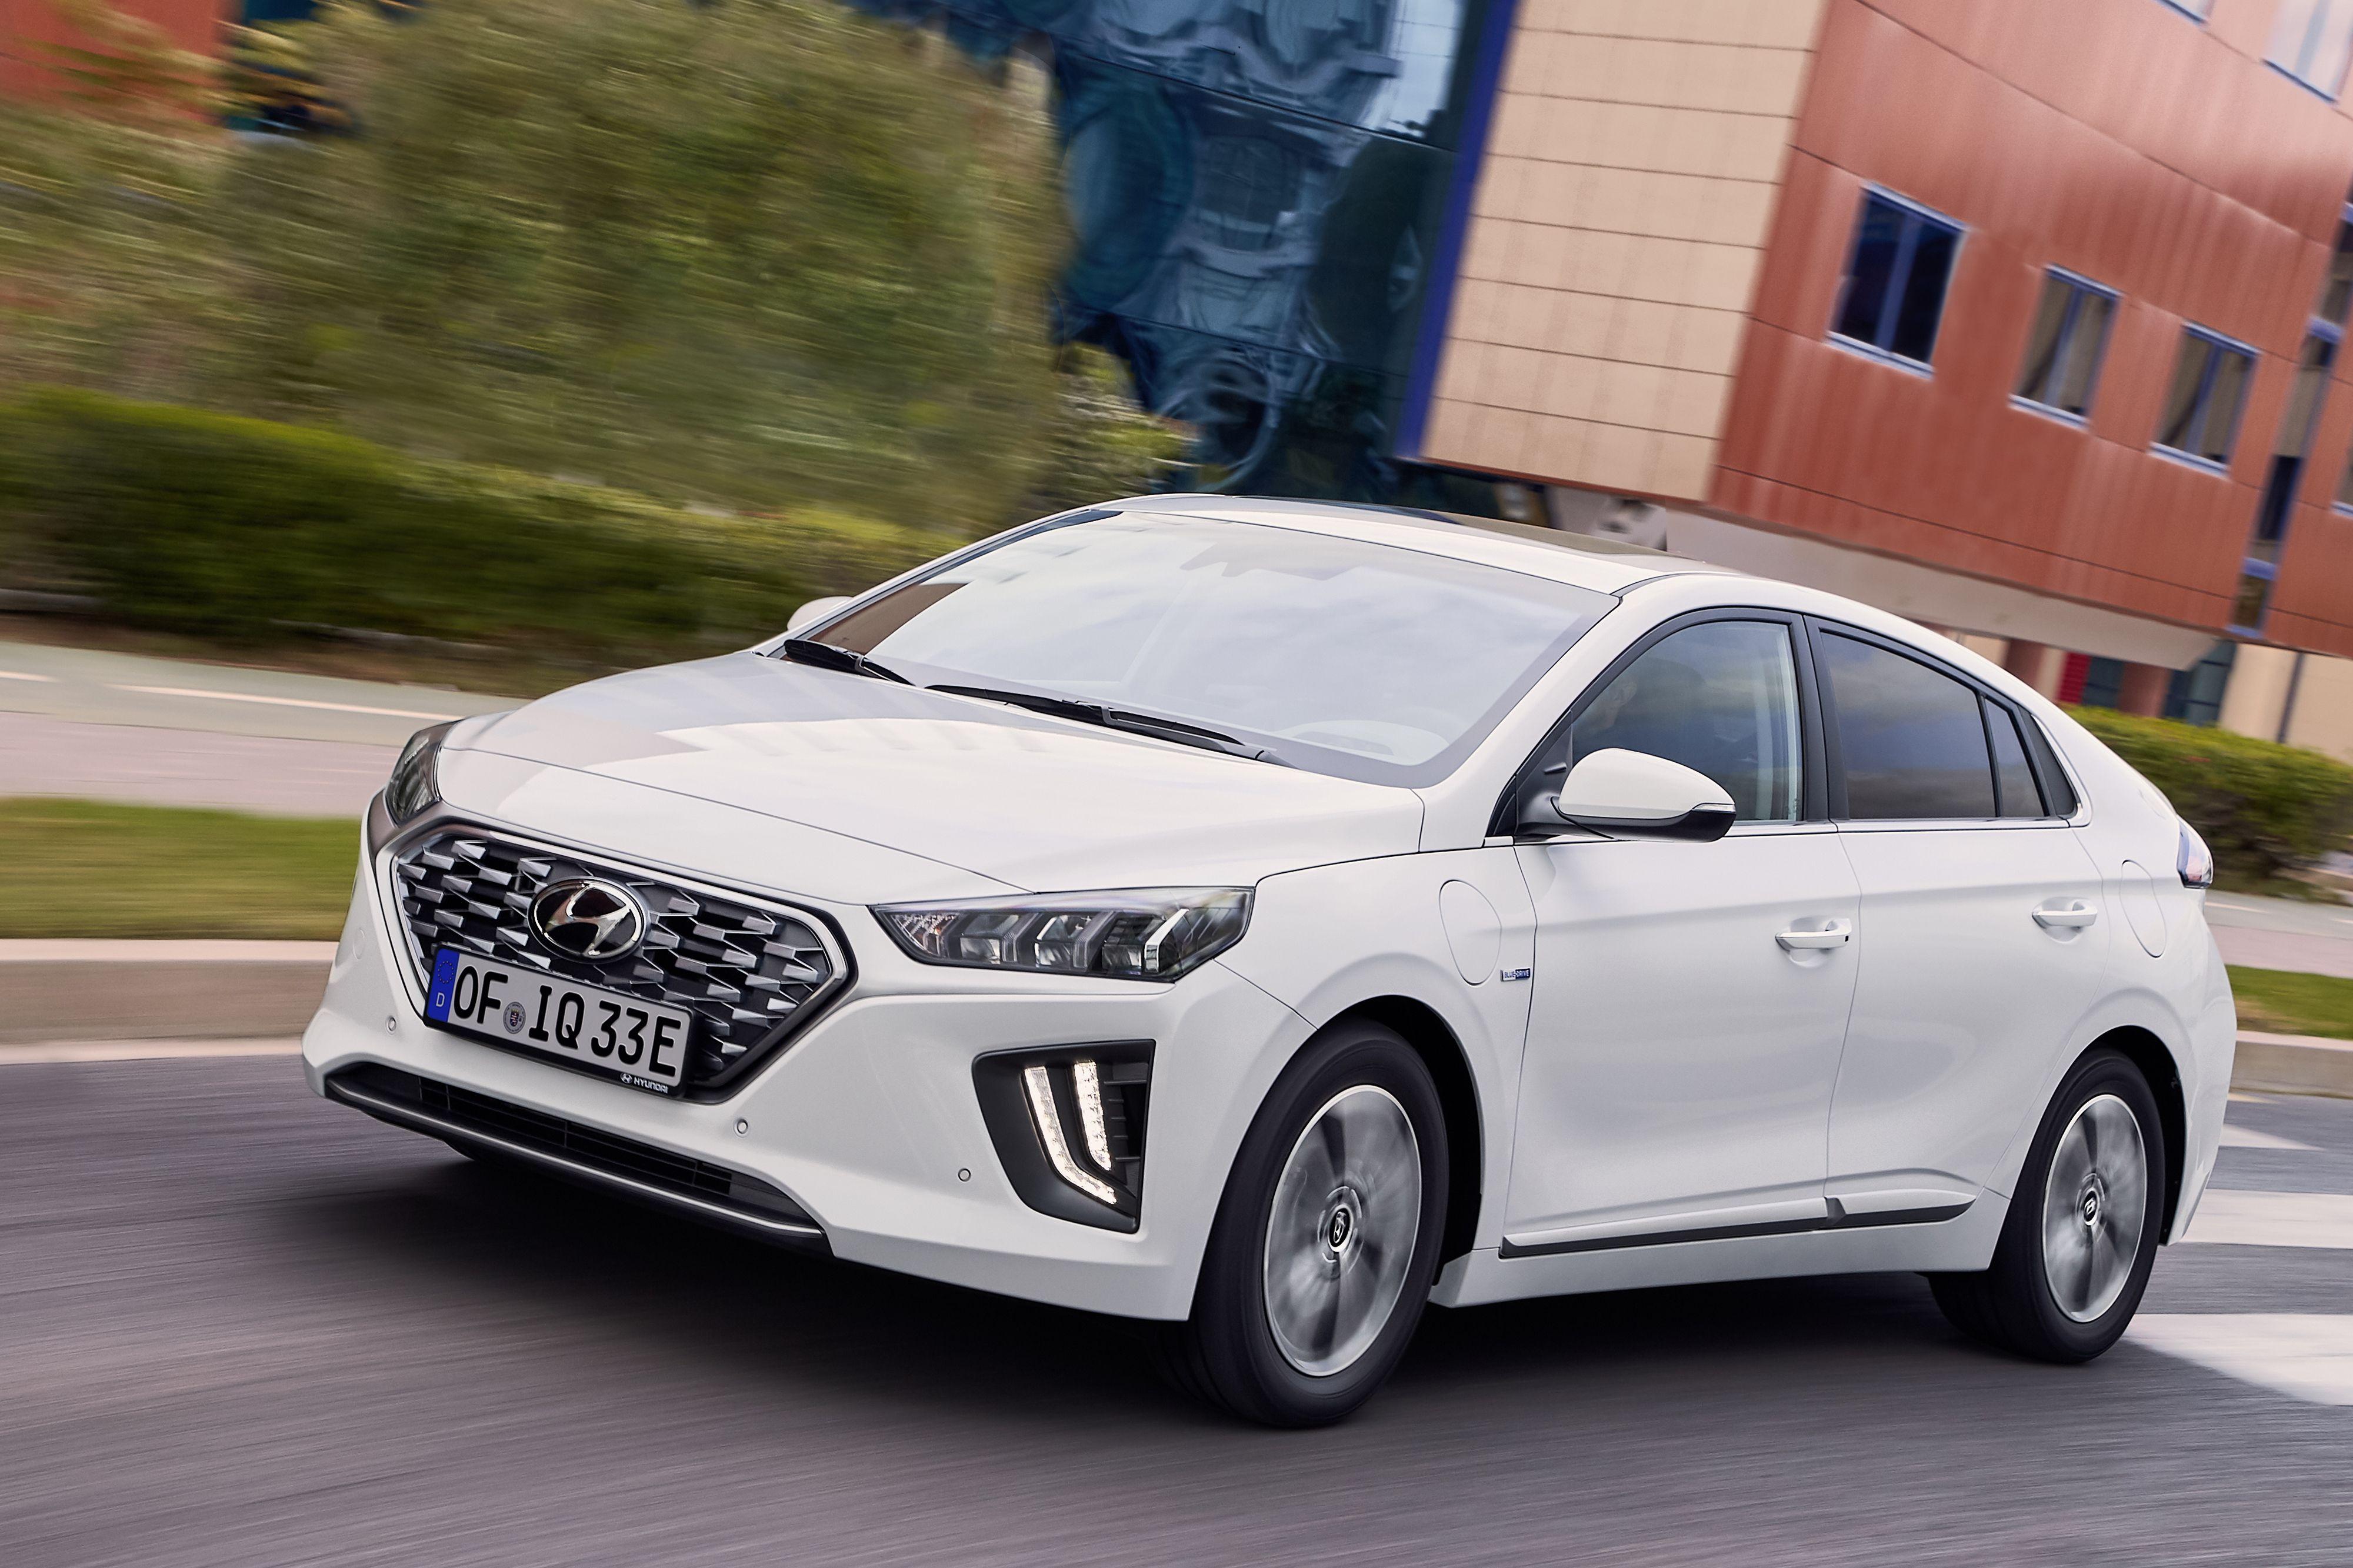 hyundai ioniq thenewestcars Hybrid car, Hyundai